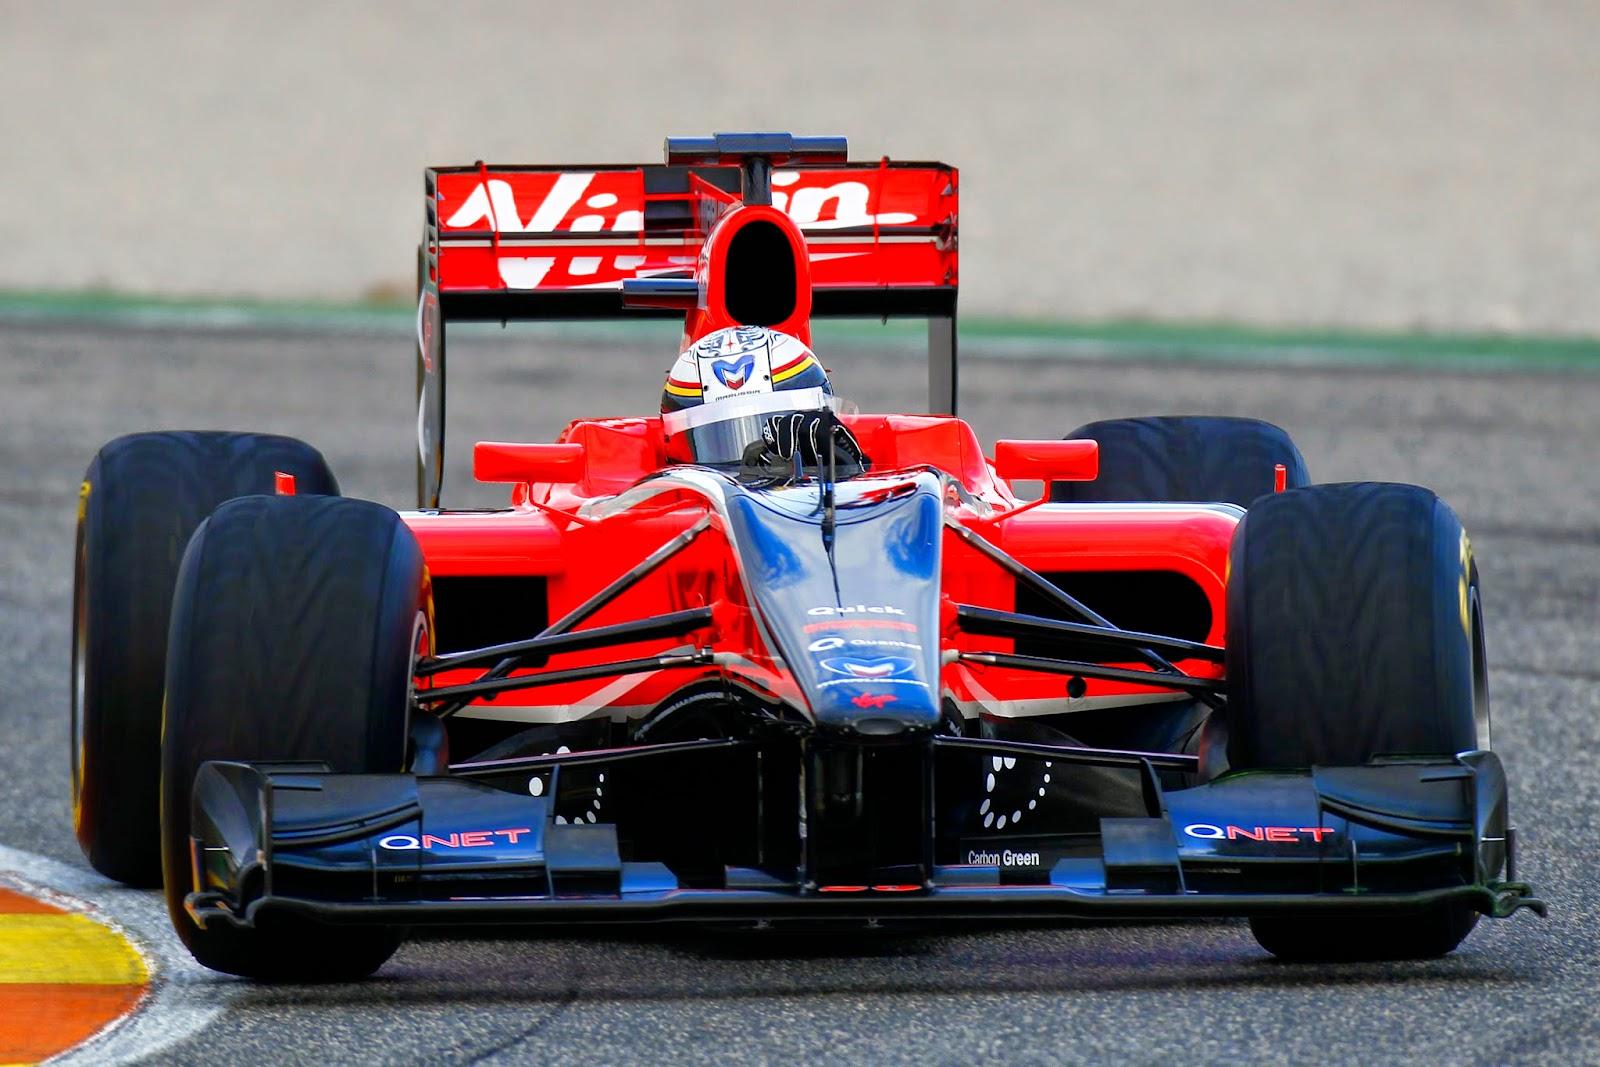 http://www.virgin.com/news/marussia-virgin-racing-testing-success